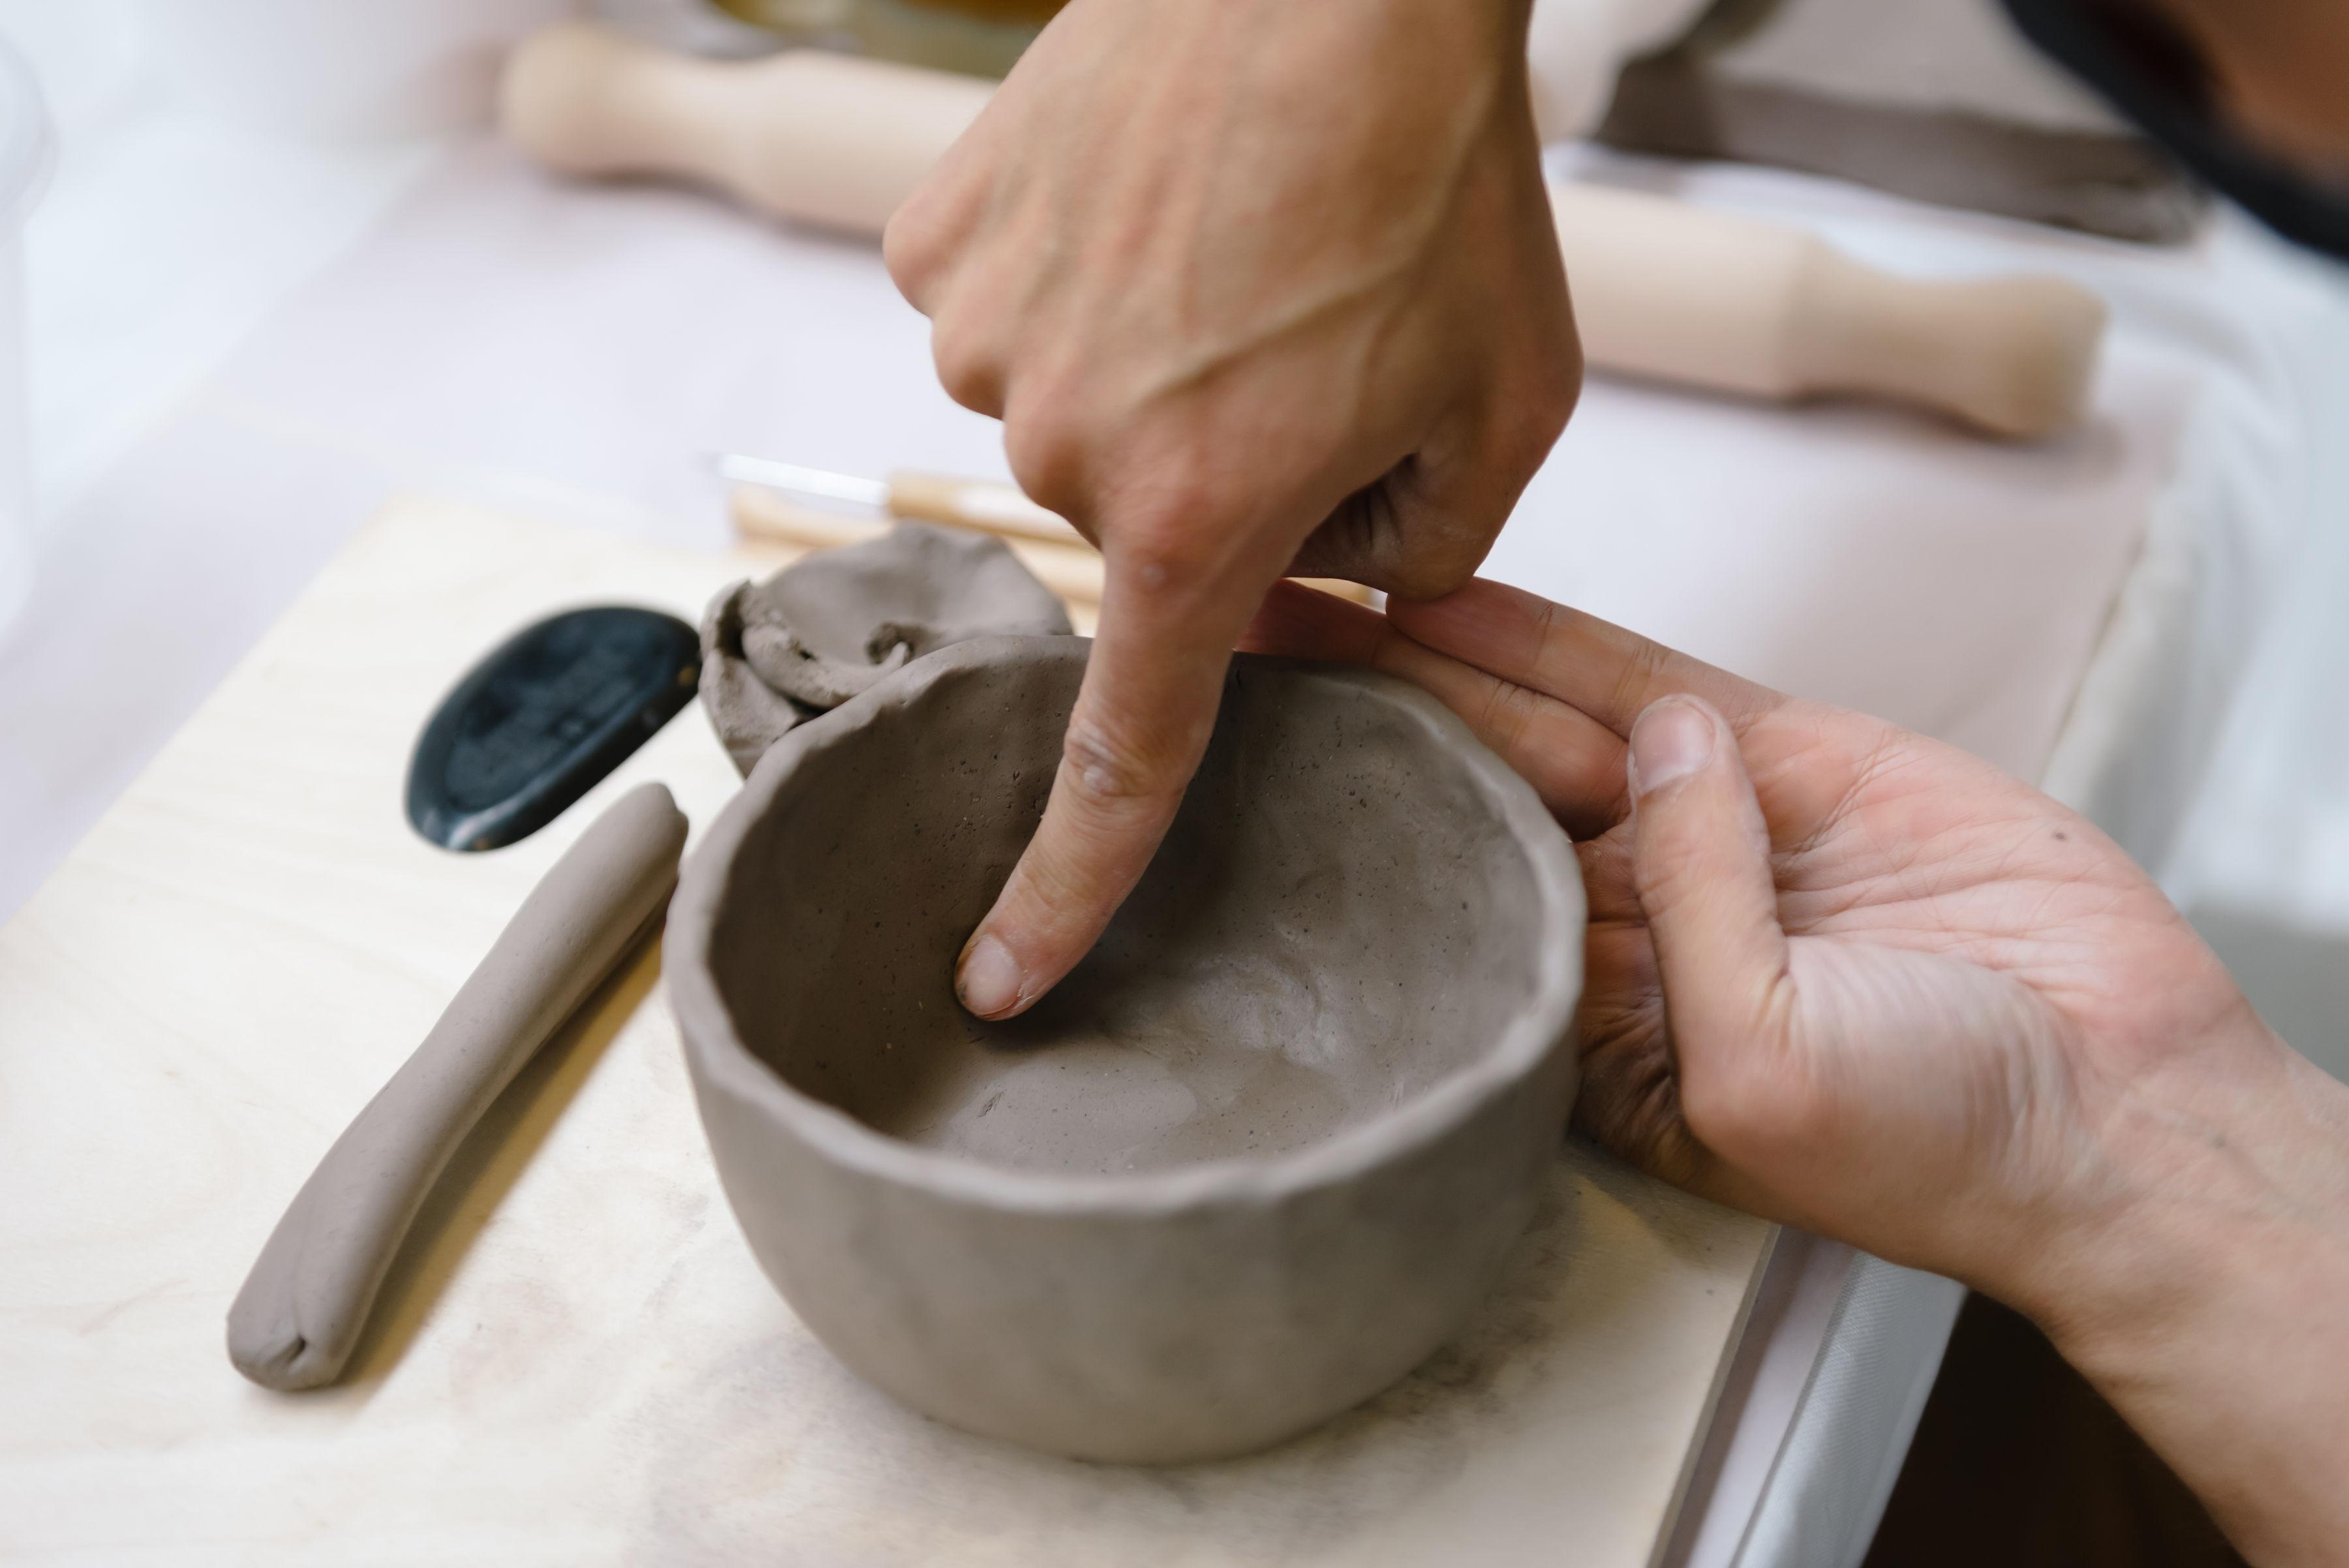 Stoker Studio's Clay and Sip Kits